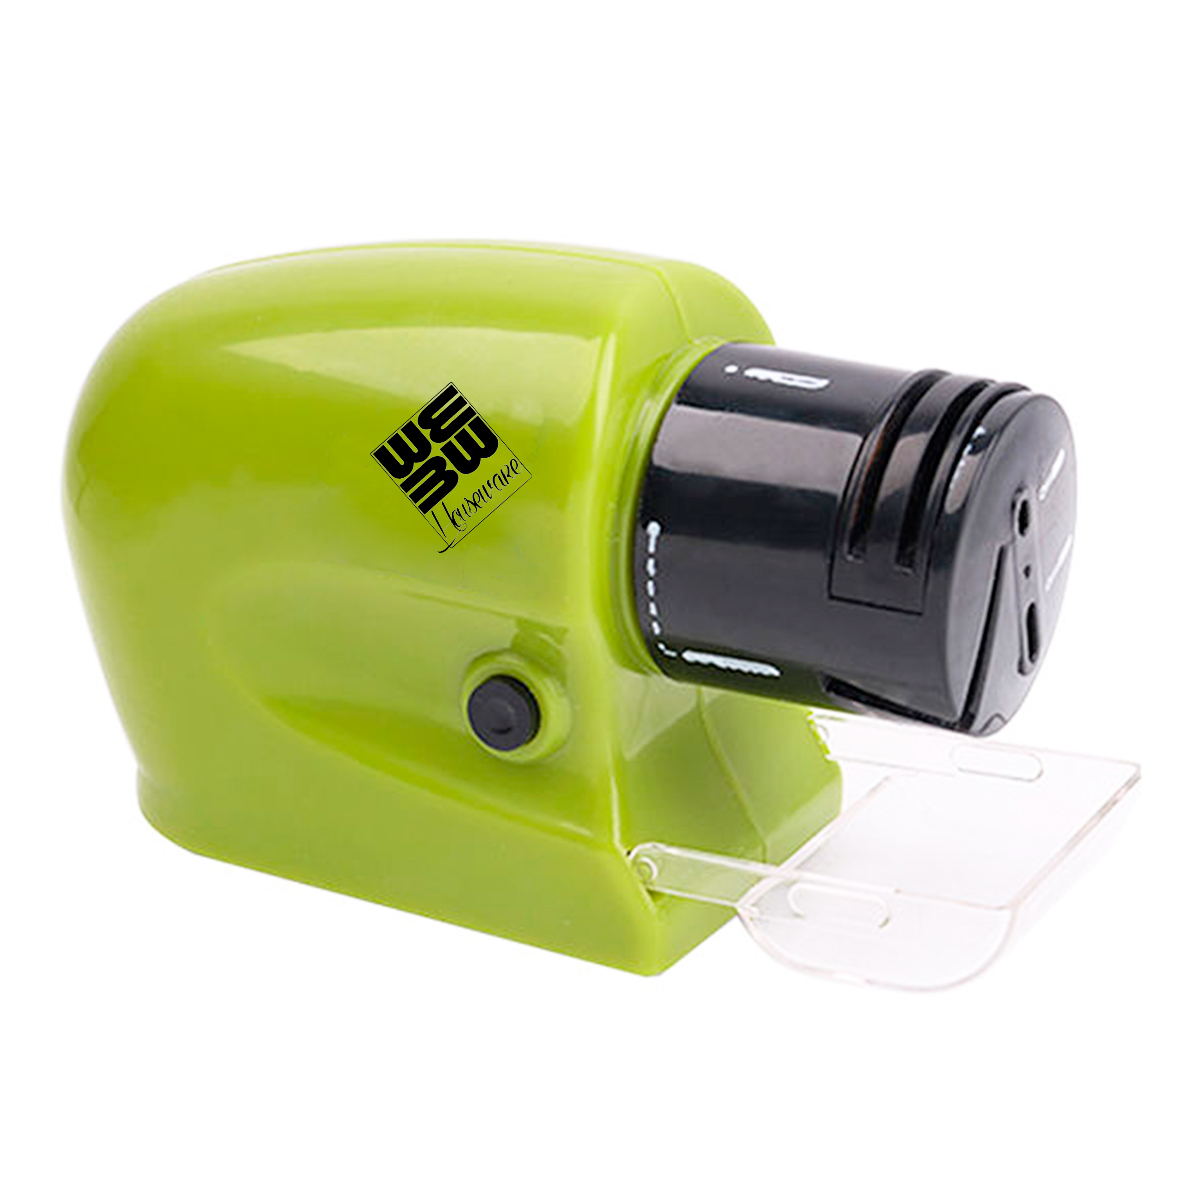 Afilador de cuchillos a pilas BN5560